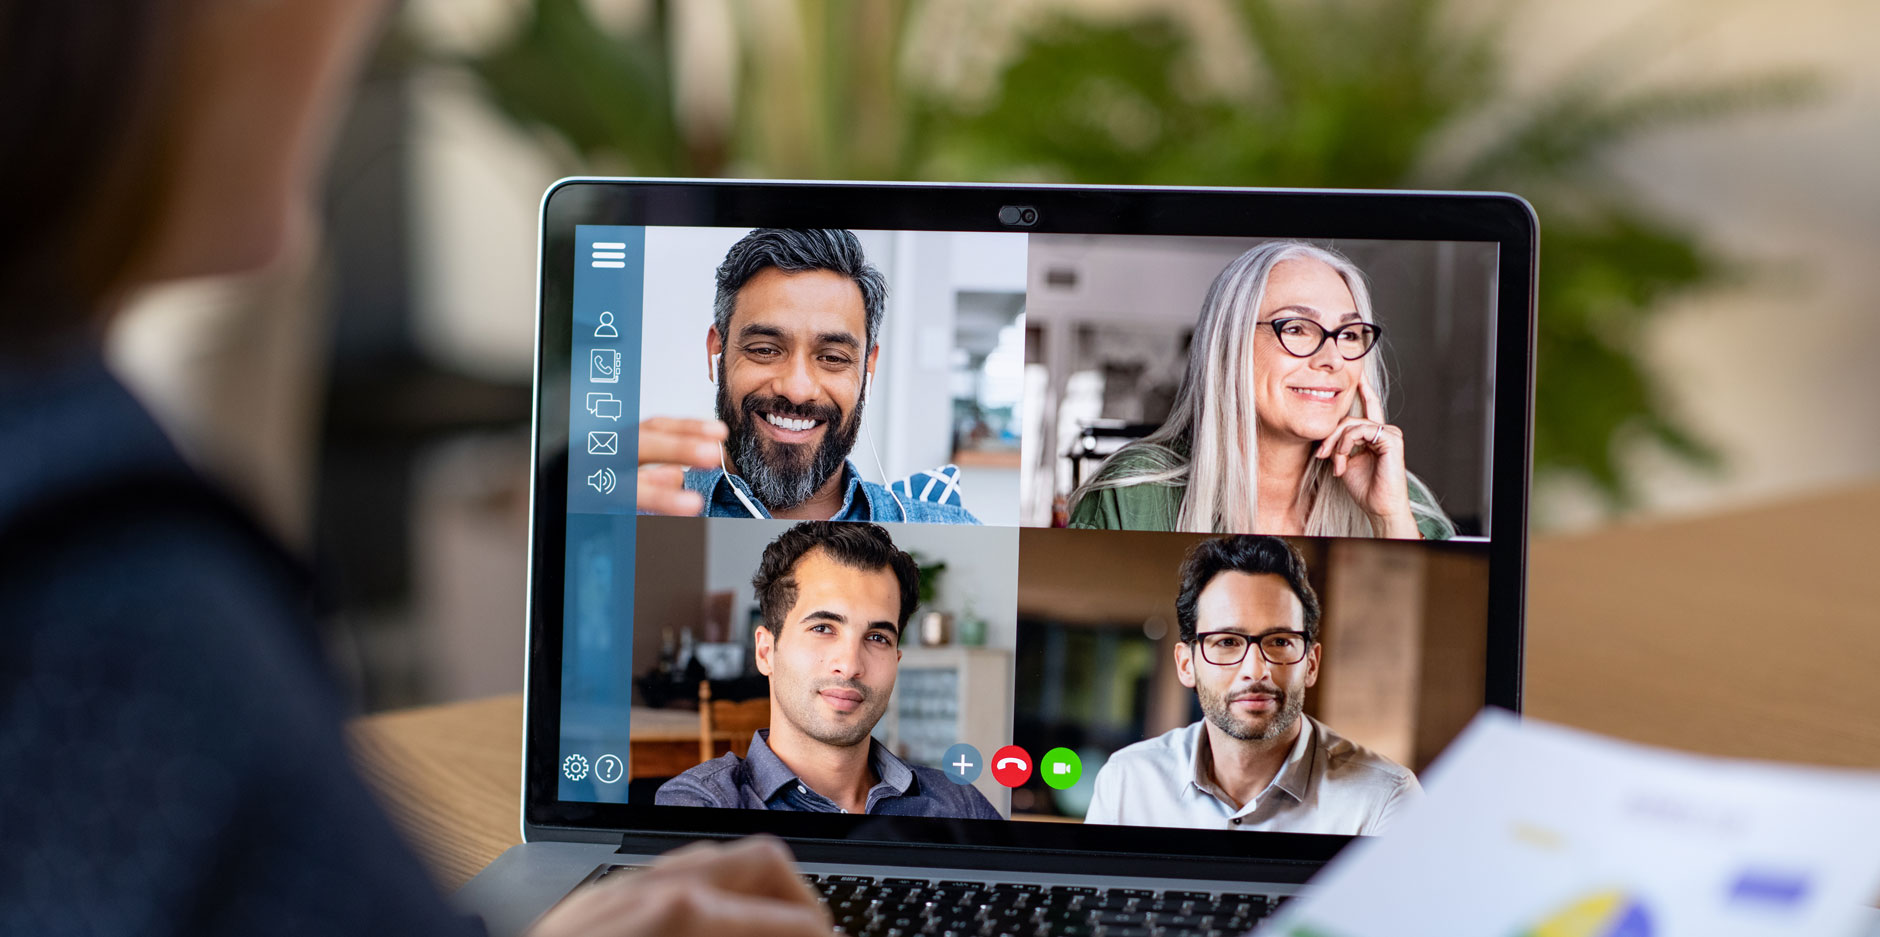 setup advice for video calls